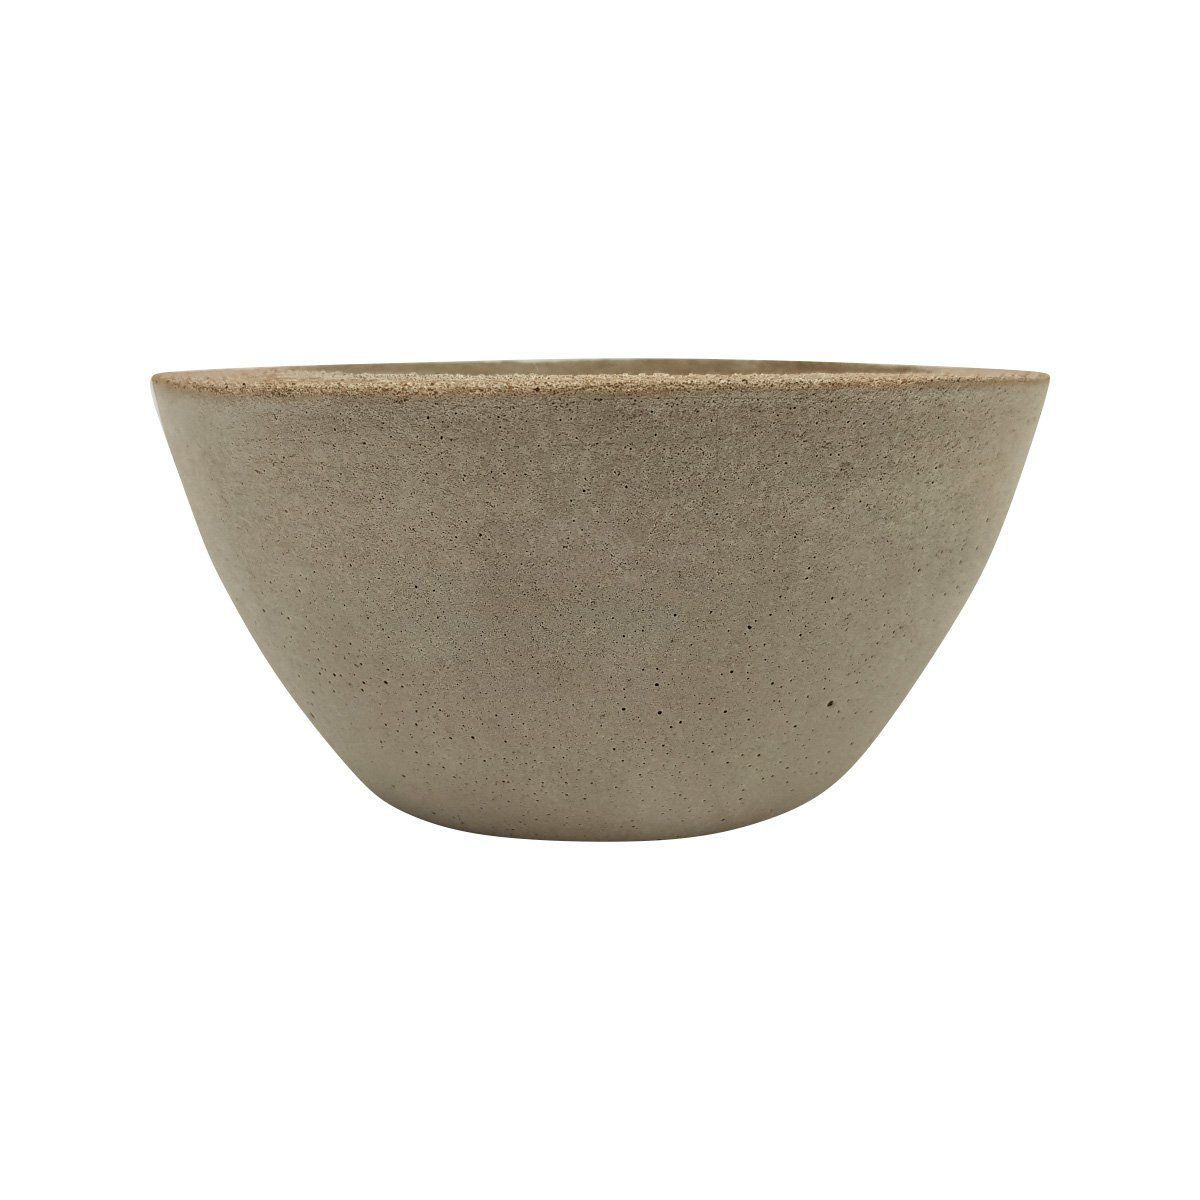 Vaso de cimento 6,5cm x 13cm MD10